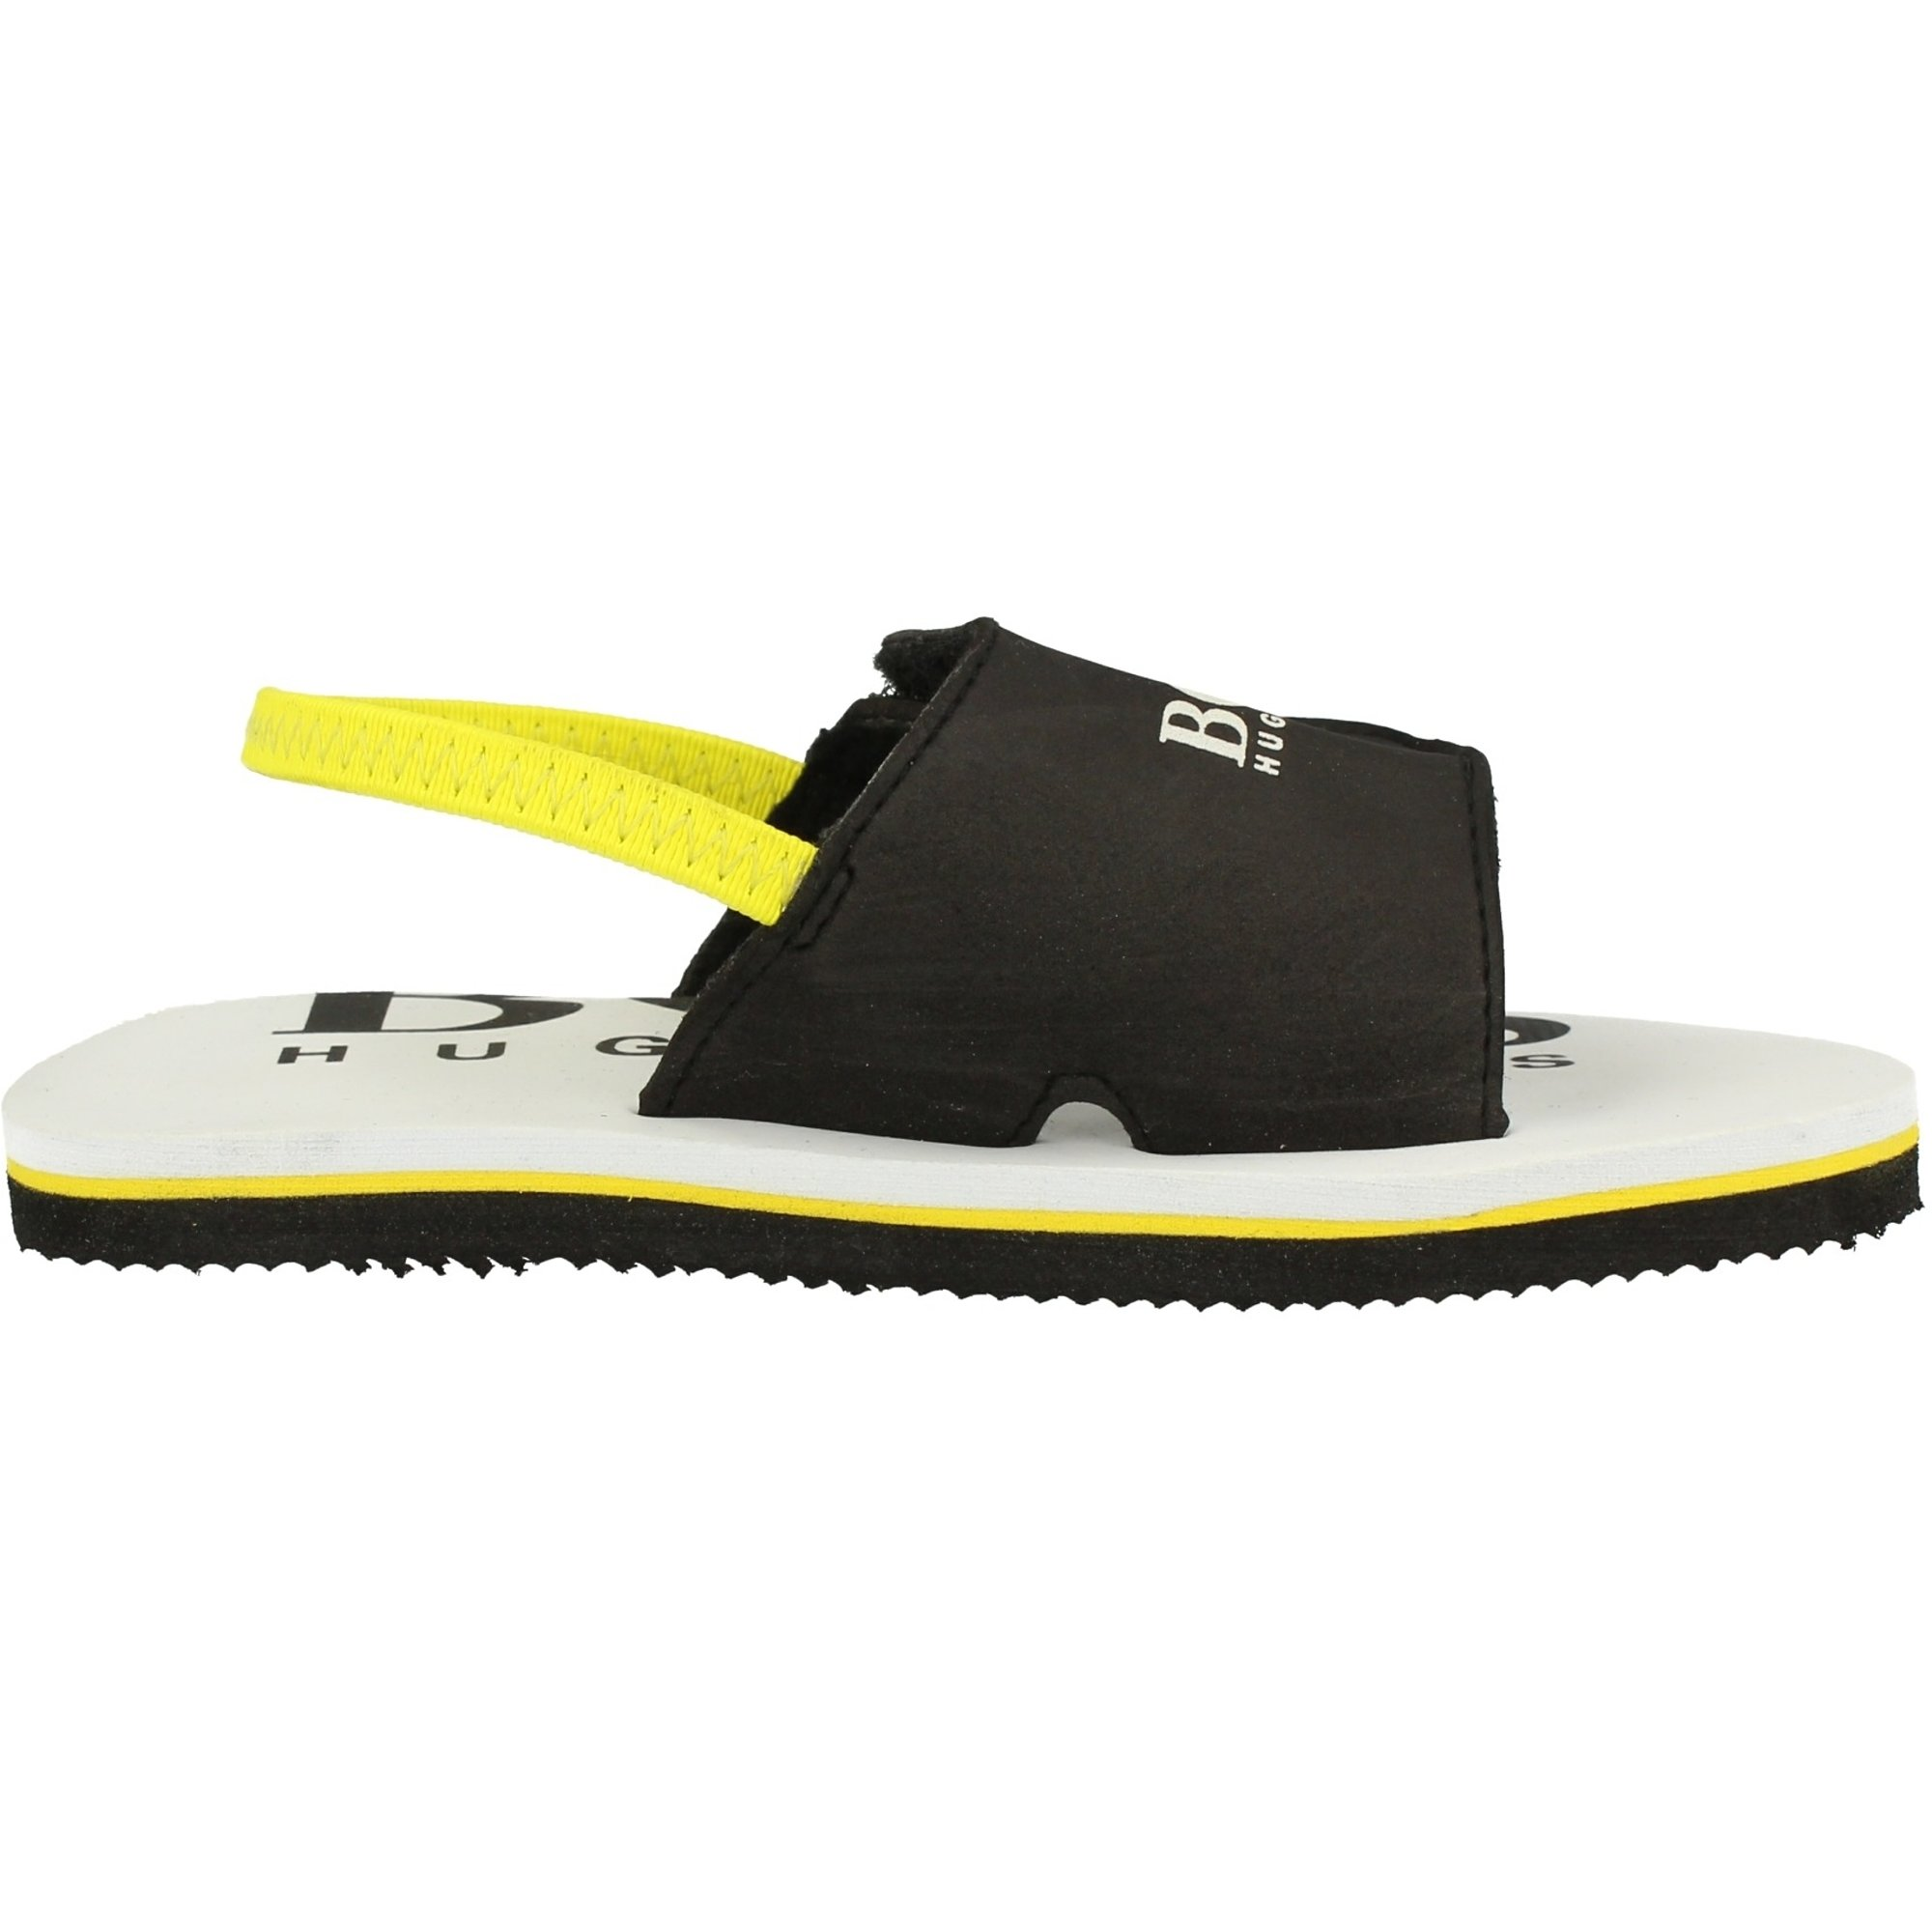 BOSS Sandals Black PU Baby